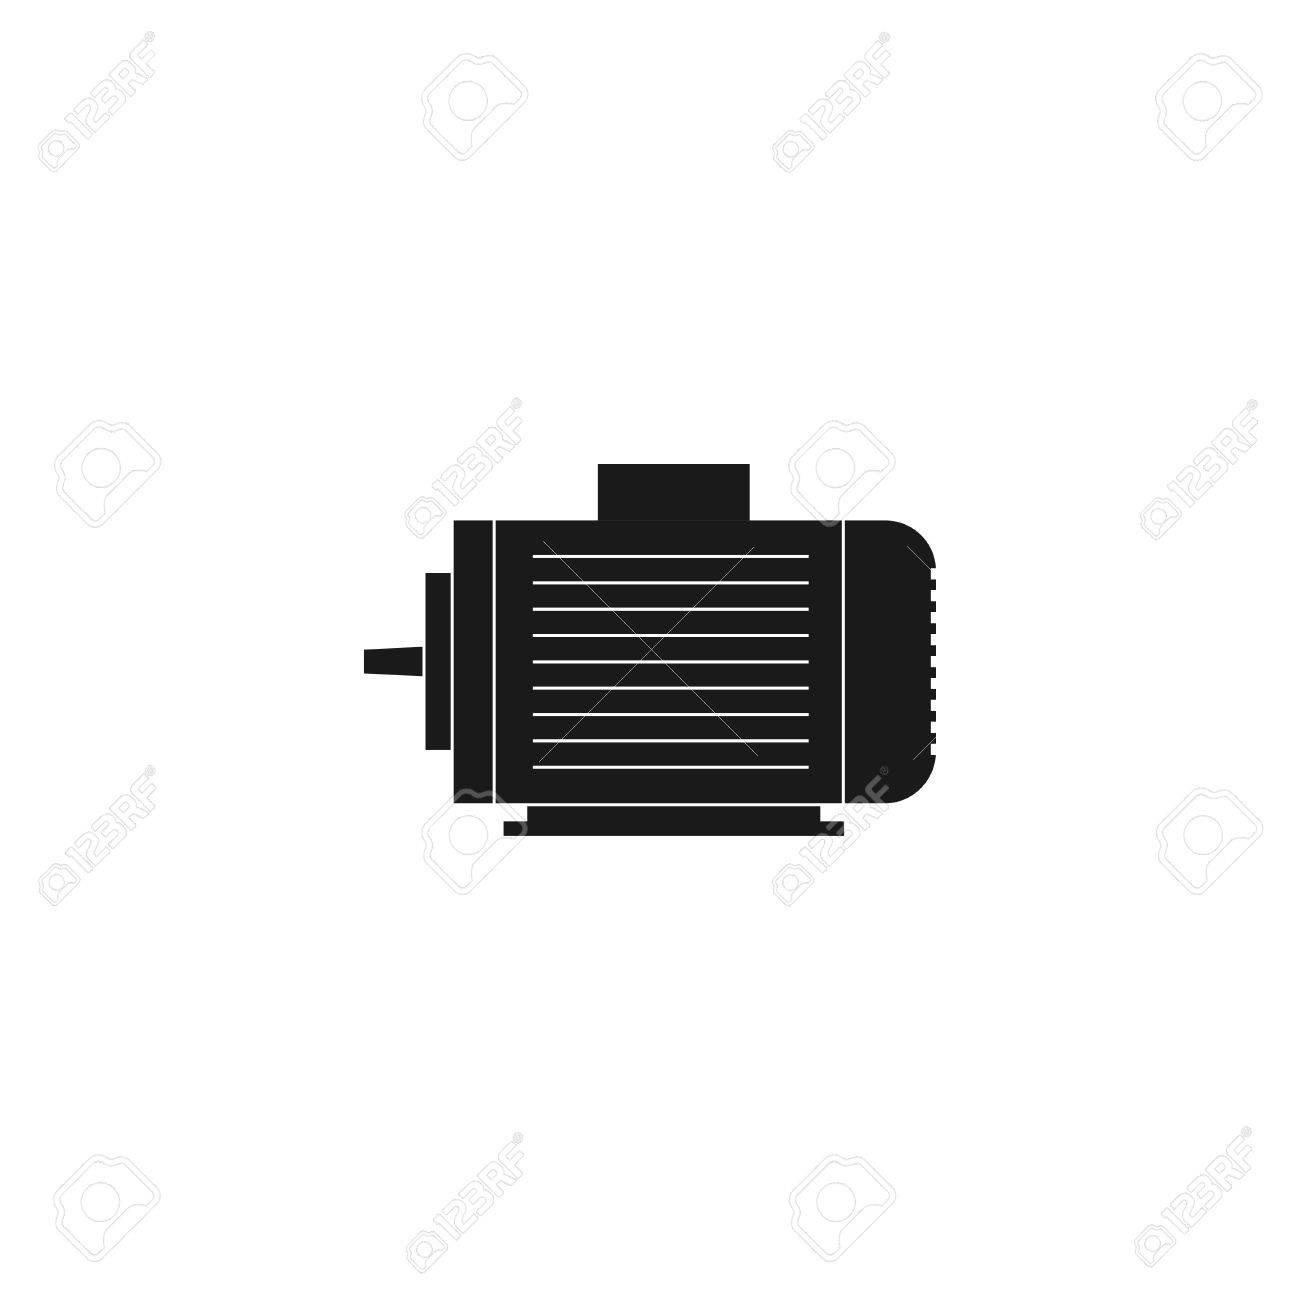 Electric Motor Symbol - Dolgular.com for Electric Motor Symbol  155sfw